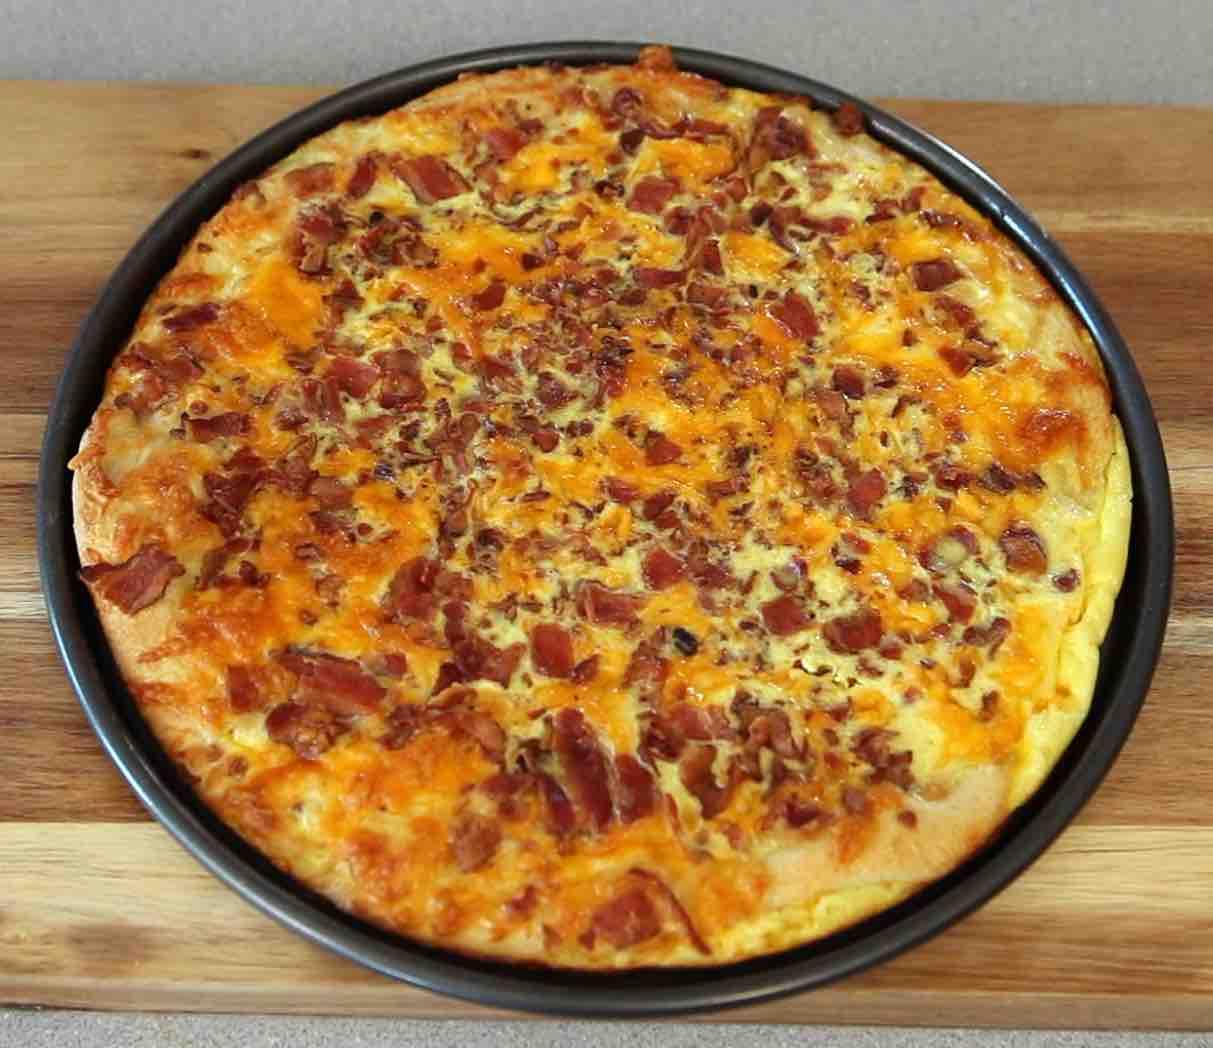 Bacon Egg & Cheese Breakfast Pizza - TipBuzz